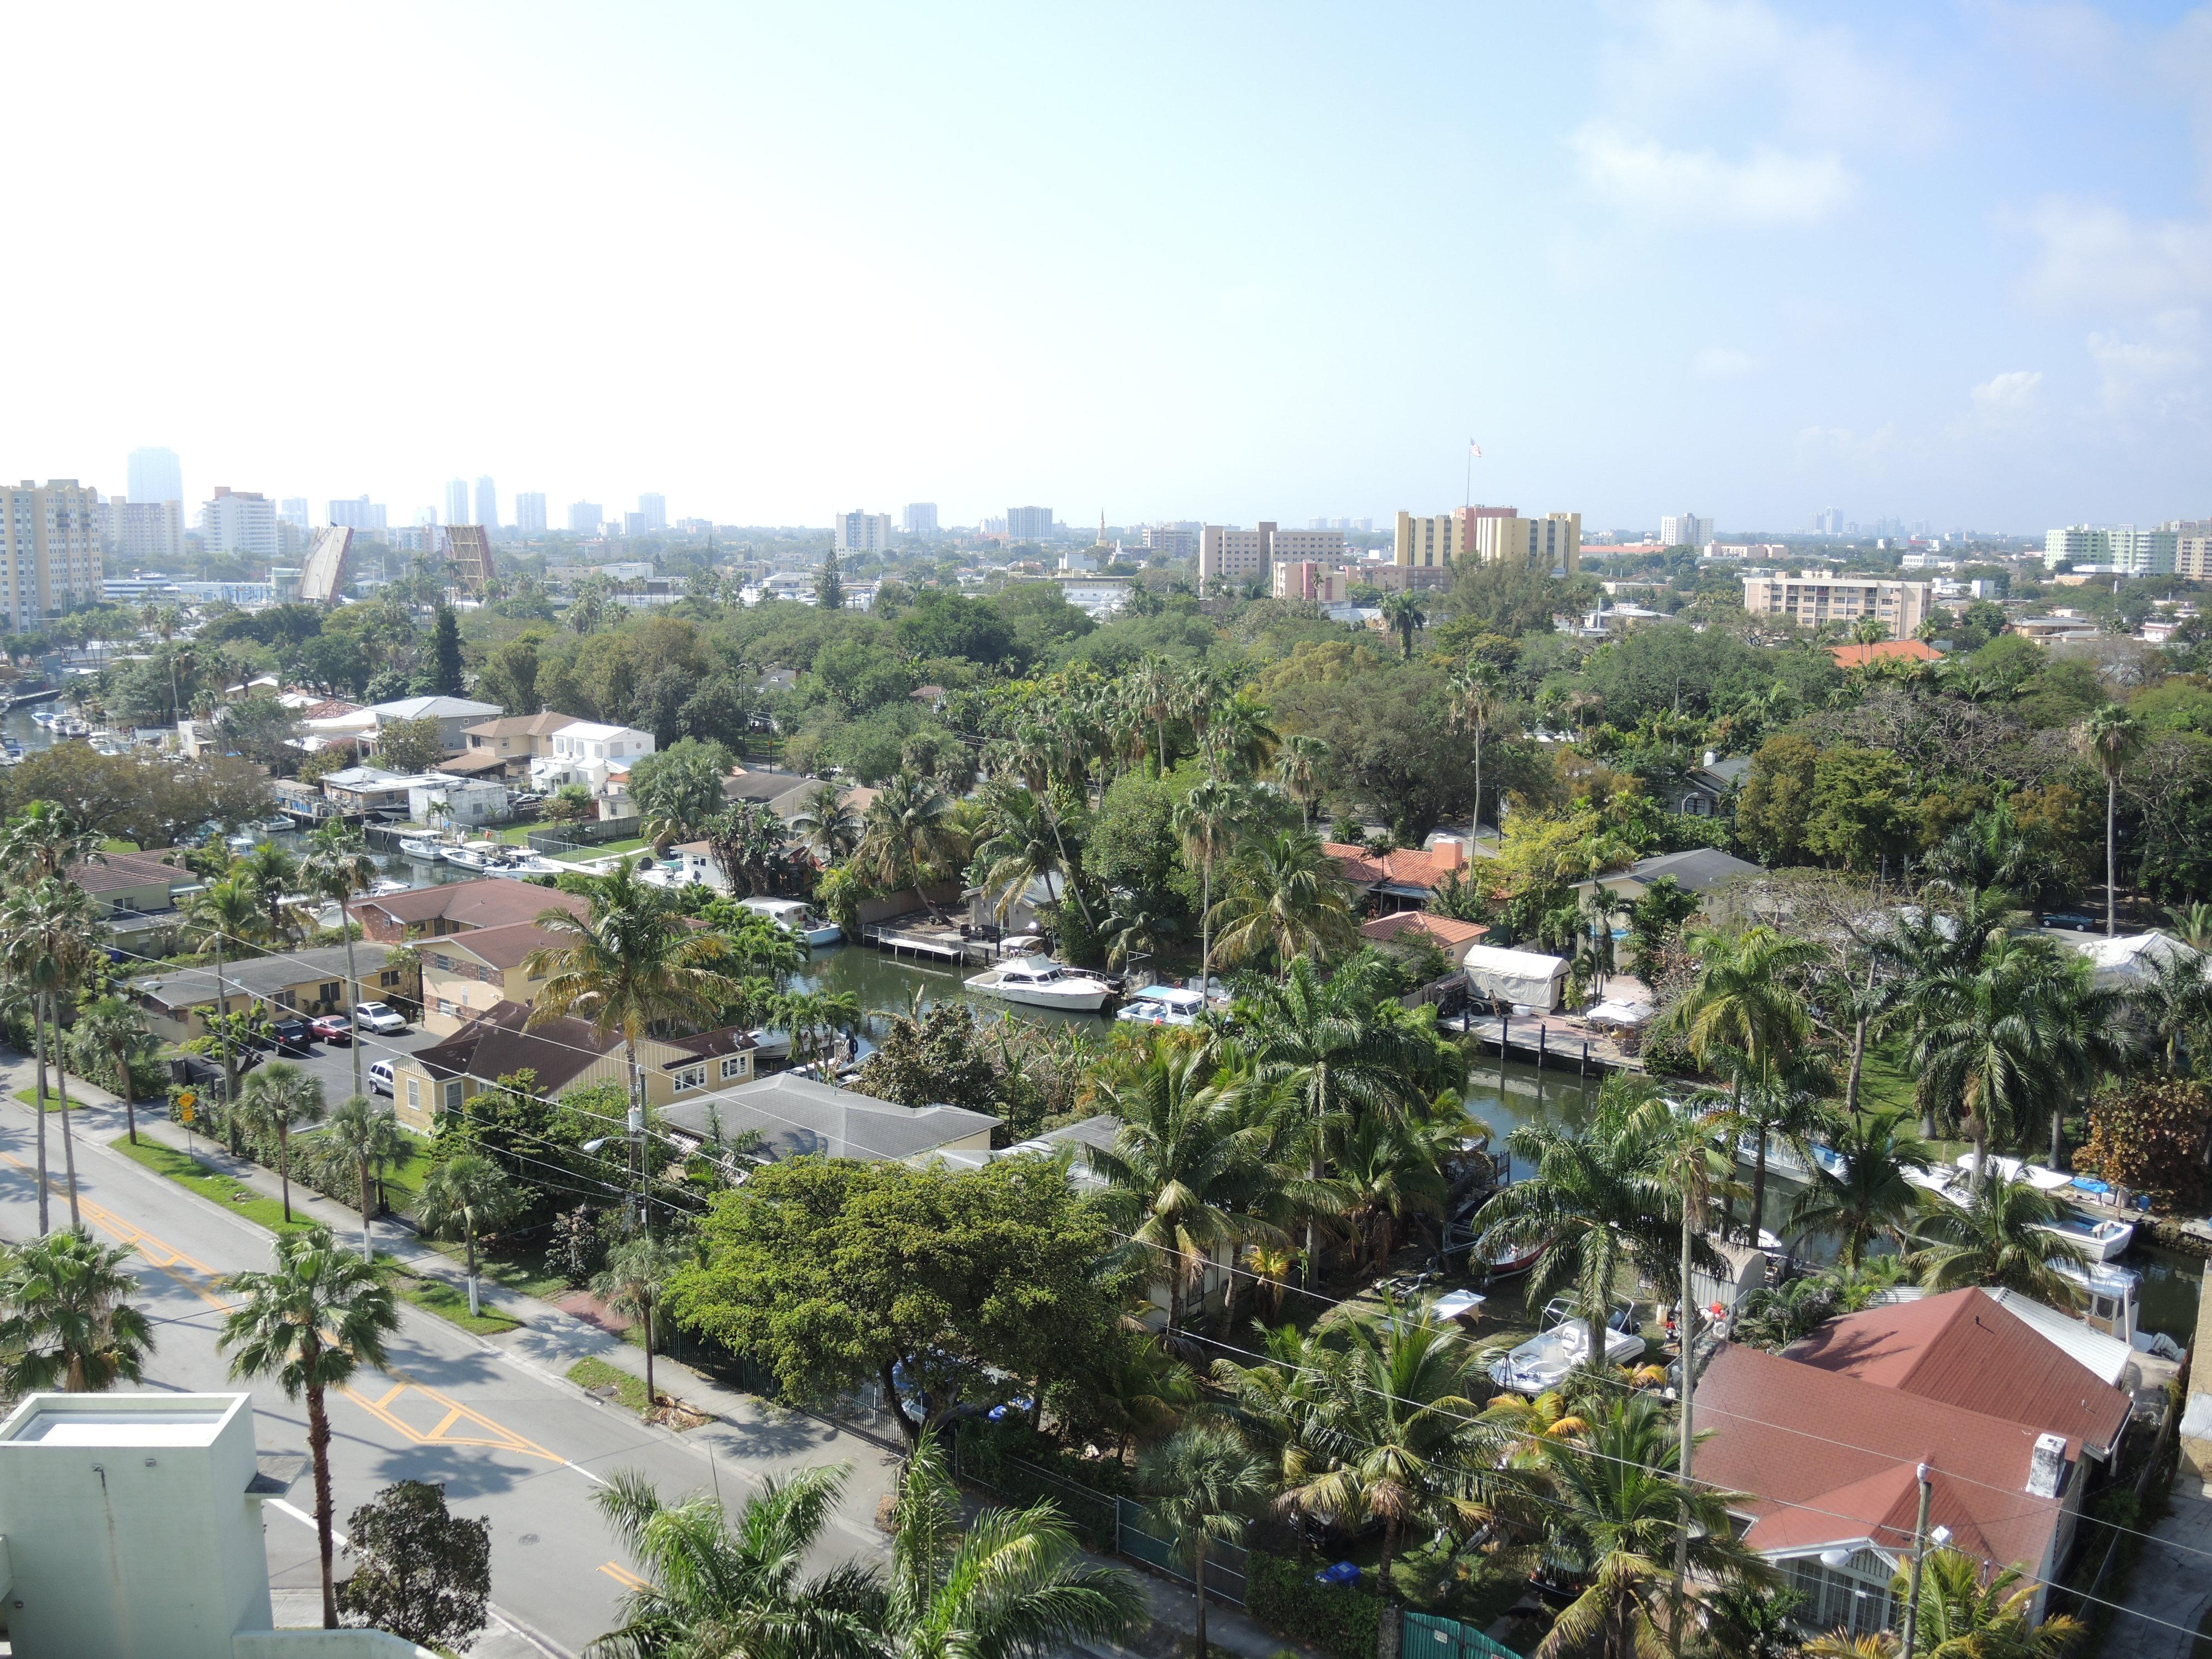 FileSpring Garden MiamiJPG Wikimedia mons